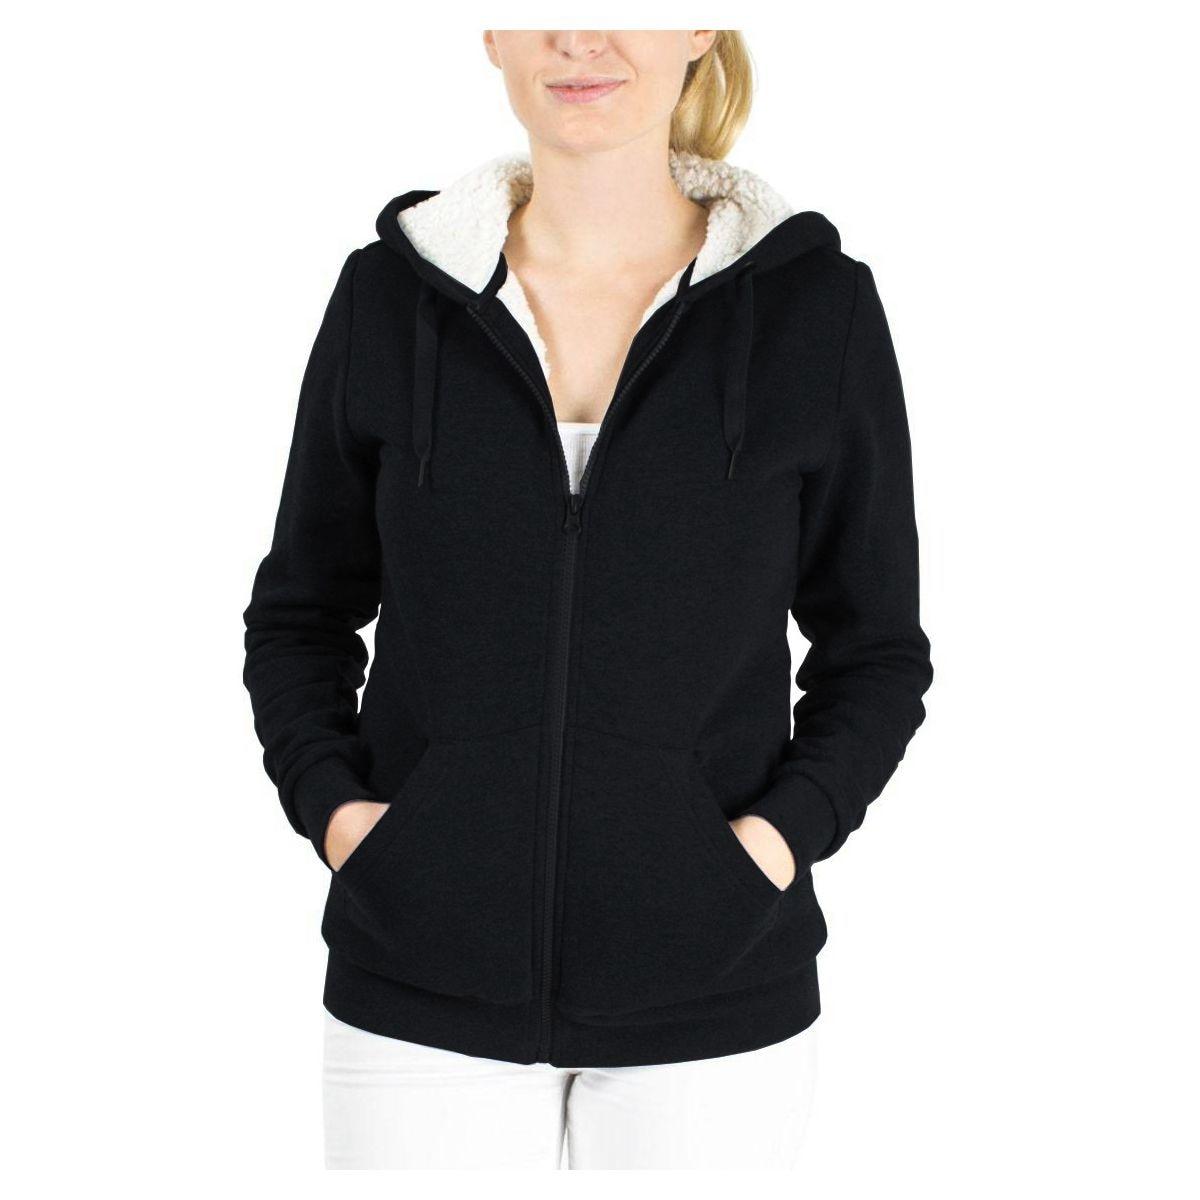 Women Hoodies Overcoat Winter Warm Thick Padded Fur Casual Solid Zip Up Outerwear Cotton Sweatshirt Jacket